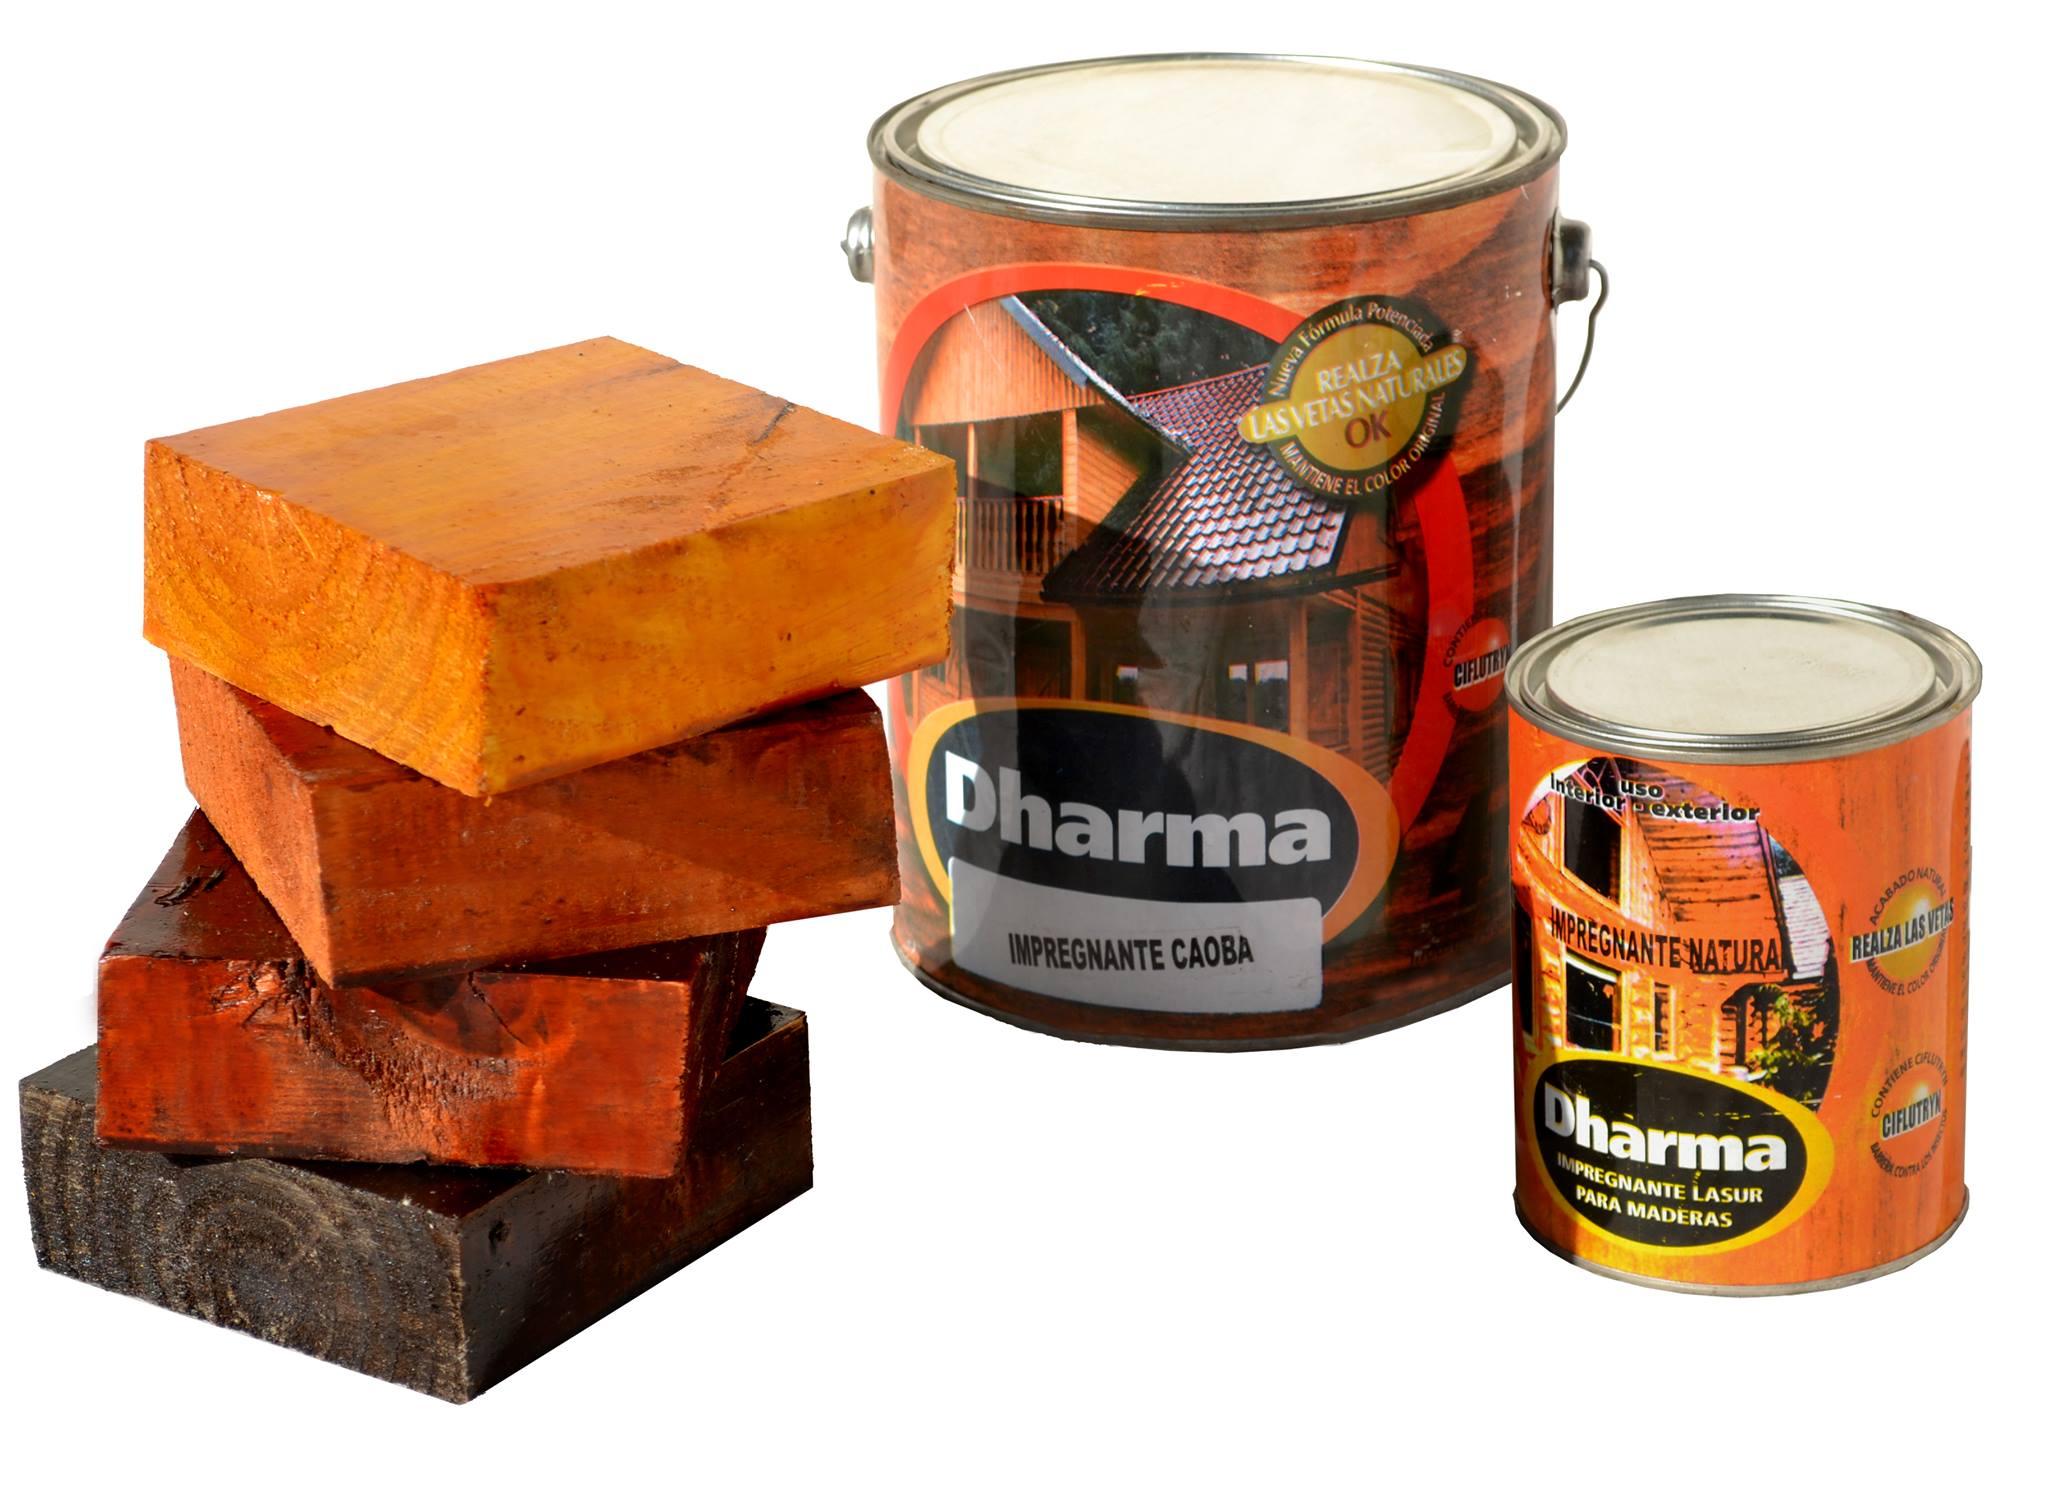 Impregnante para maderas Dharma  x 4 lts